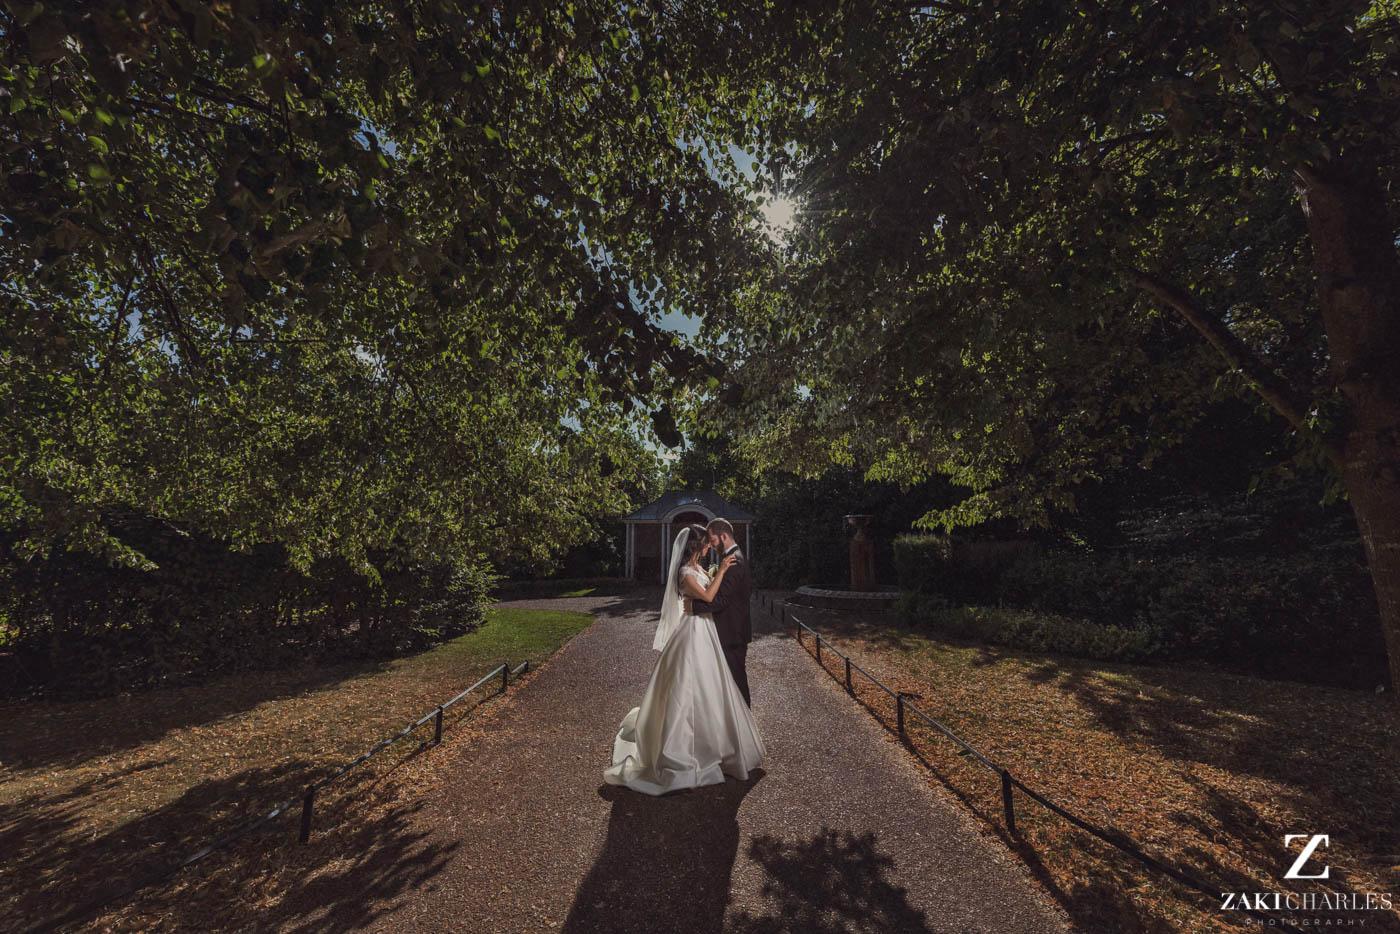 Fine art wedding photography at Marriott Hotel Regents Park 4